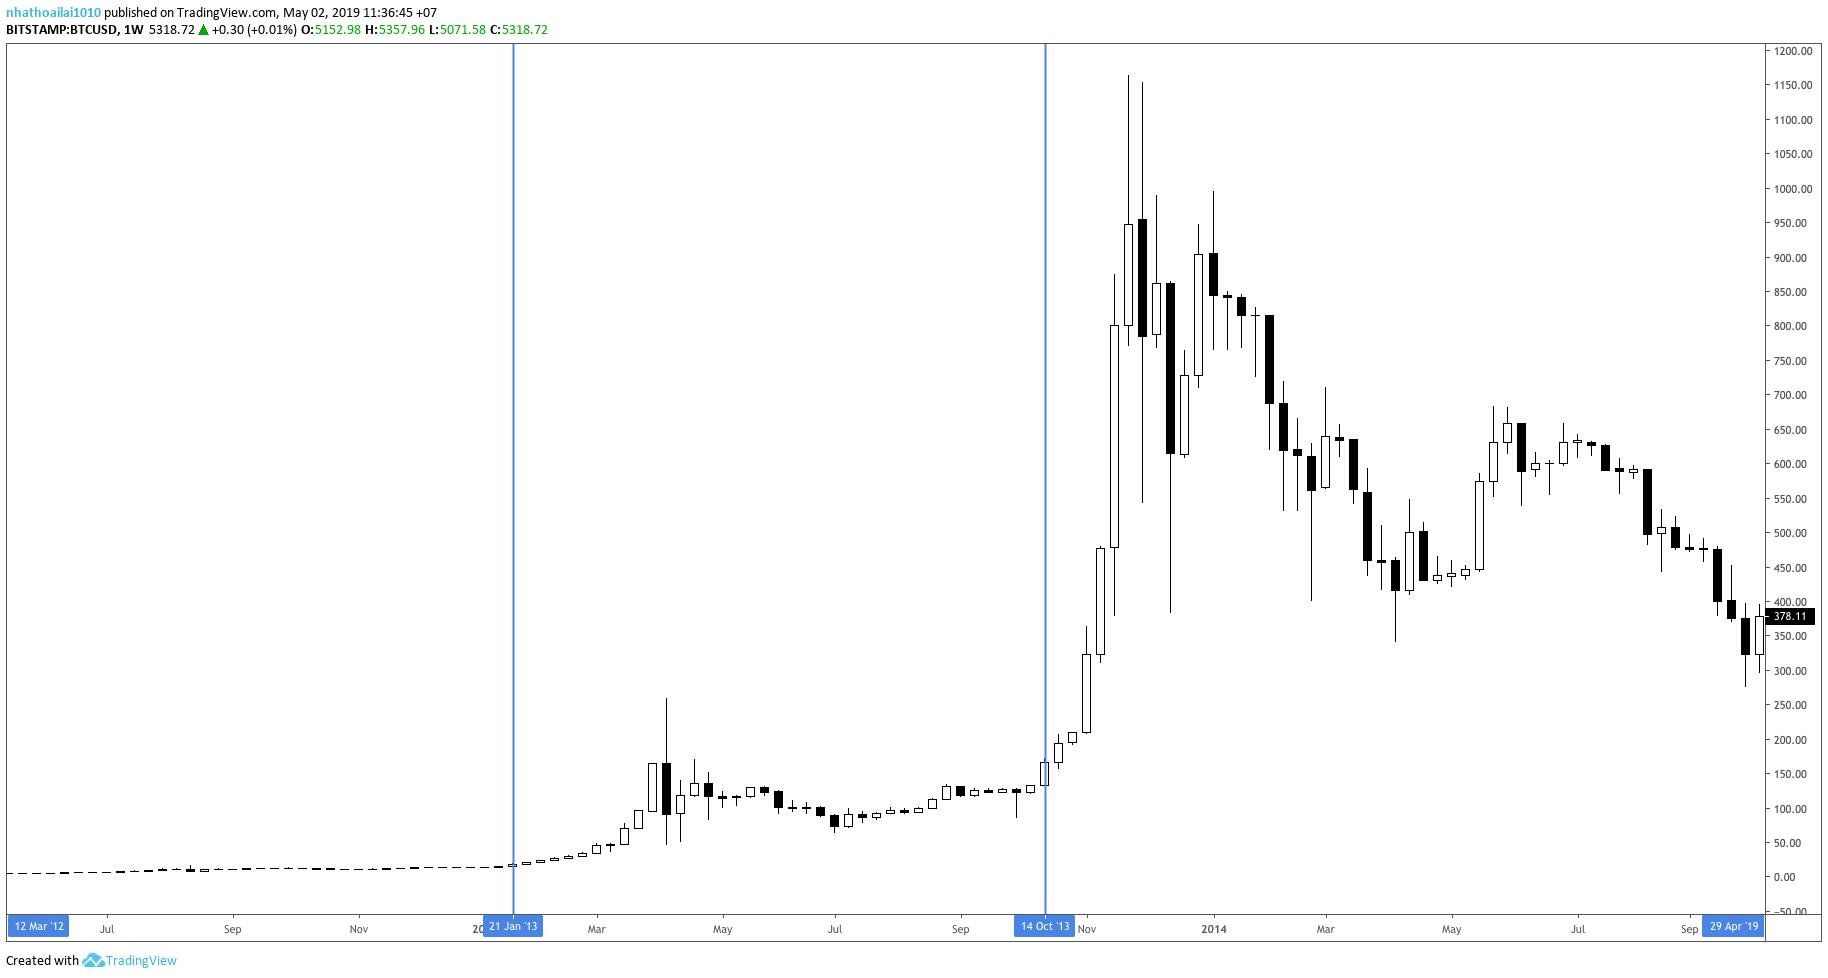 bitcoin-sp500-traderviet4.